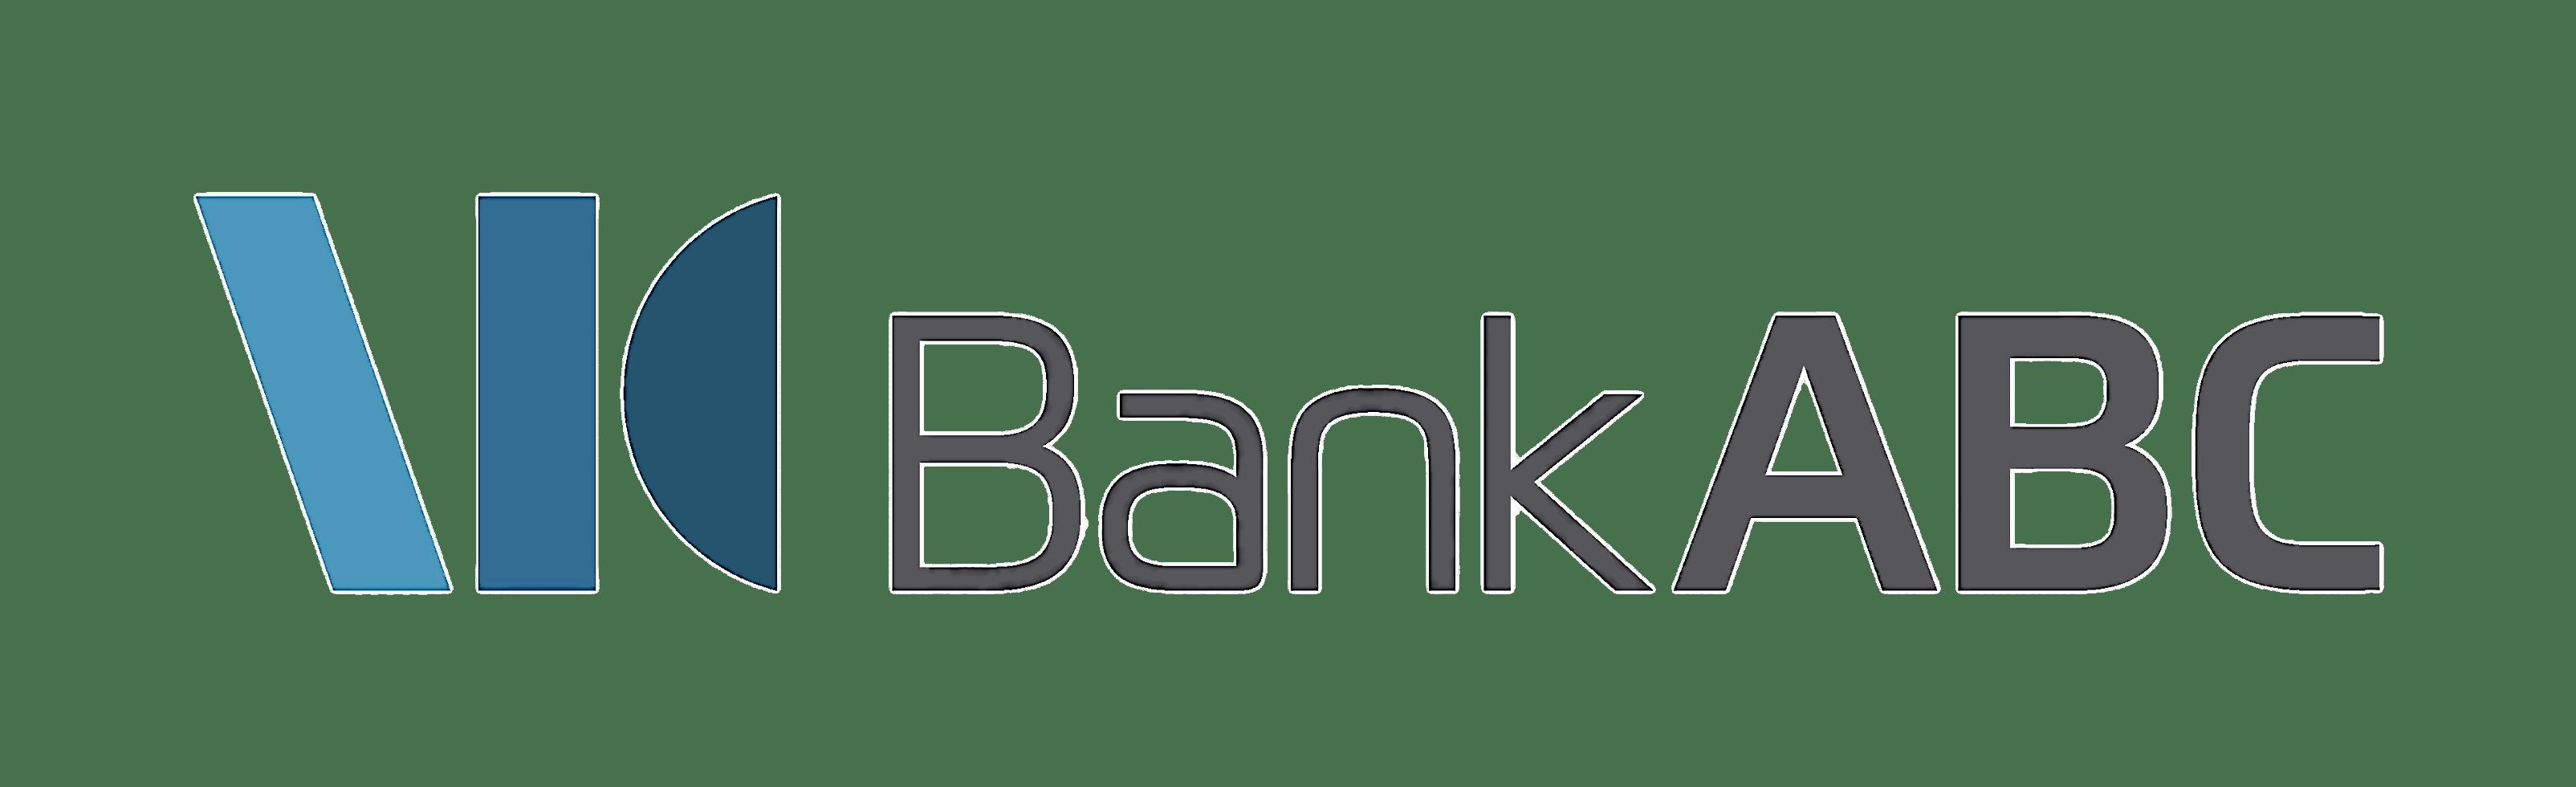 Abc Bank Logo